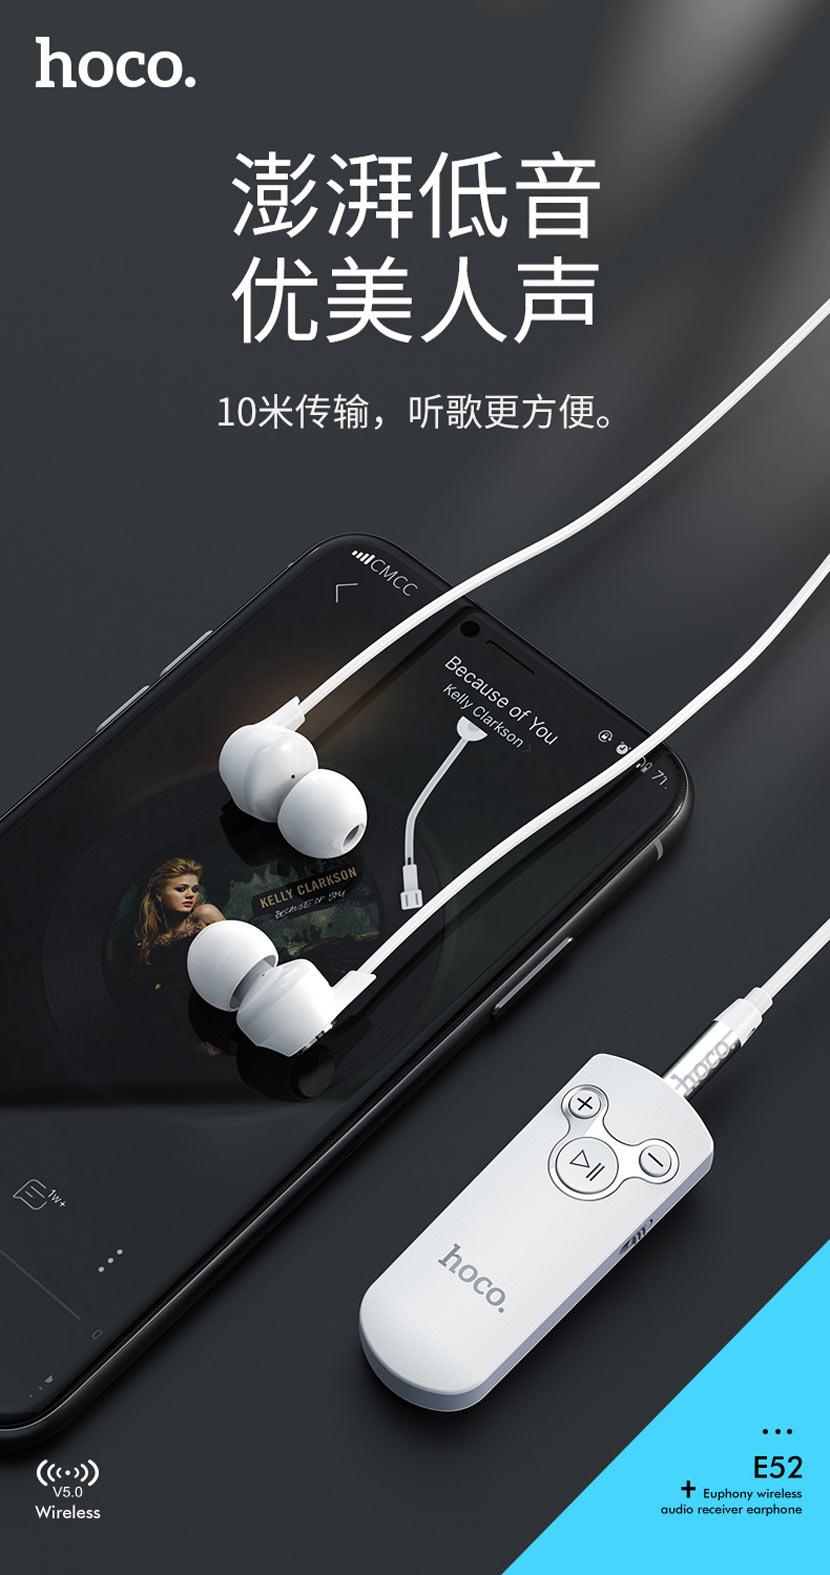 hoco news e52 euphony wireless audio receiver earphones bass cn